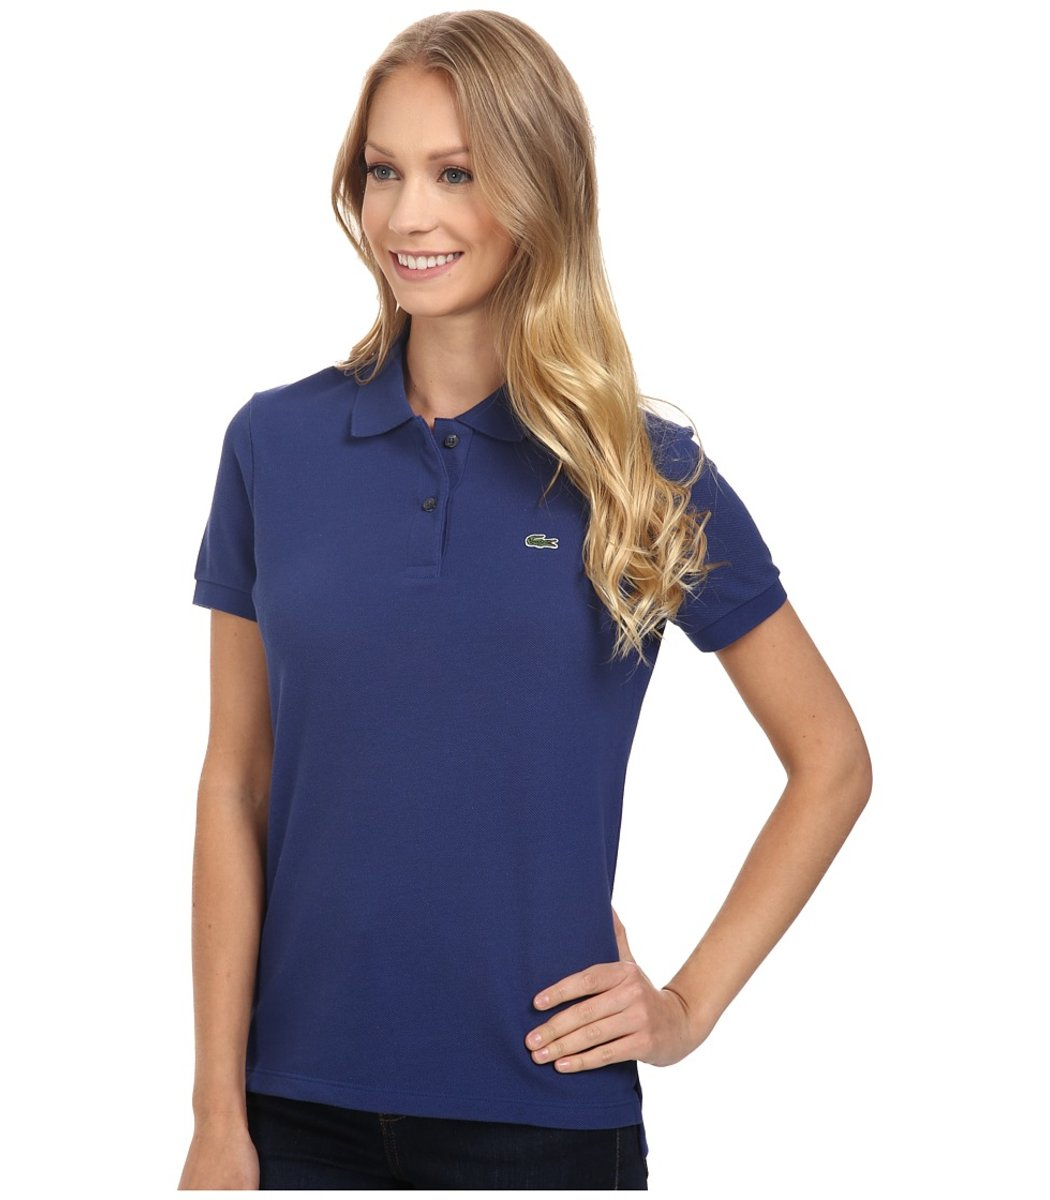 Женская темно-синяя футболка поло Lacoste